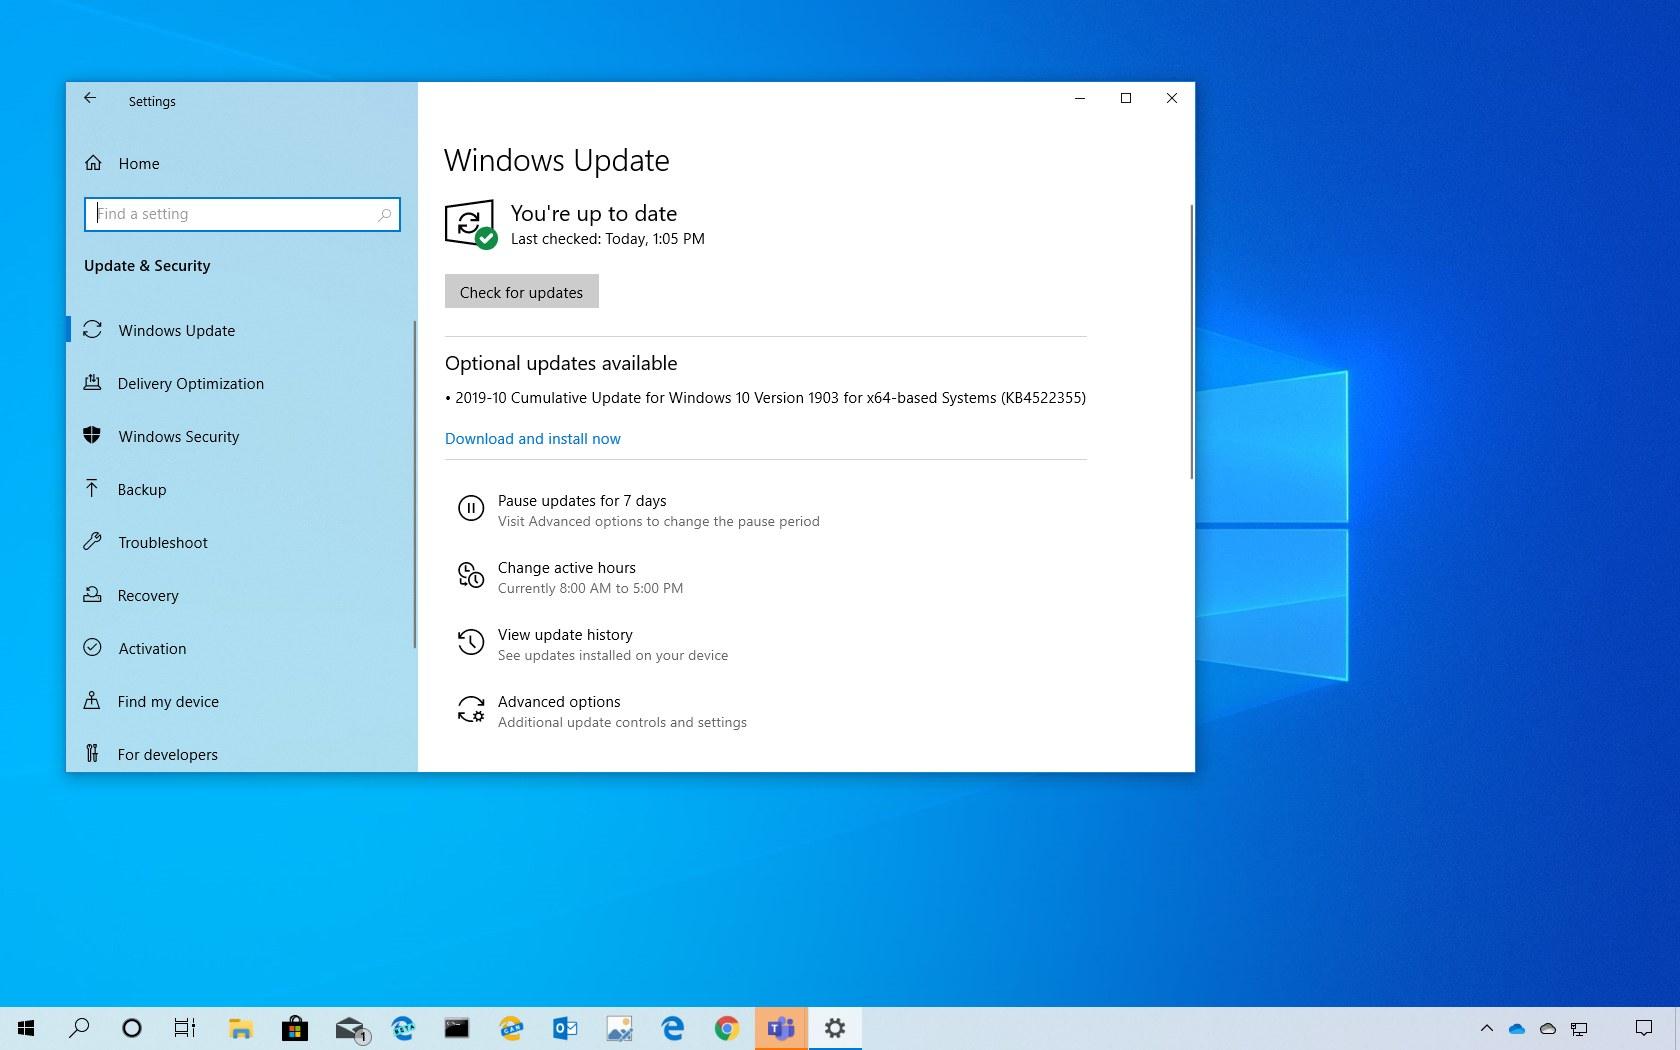 KB4522355 update for Windows 10 version 1903 download